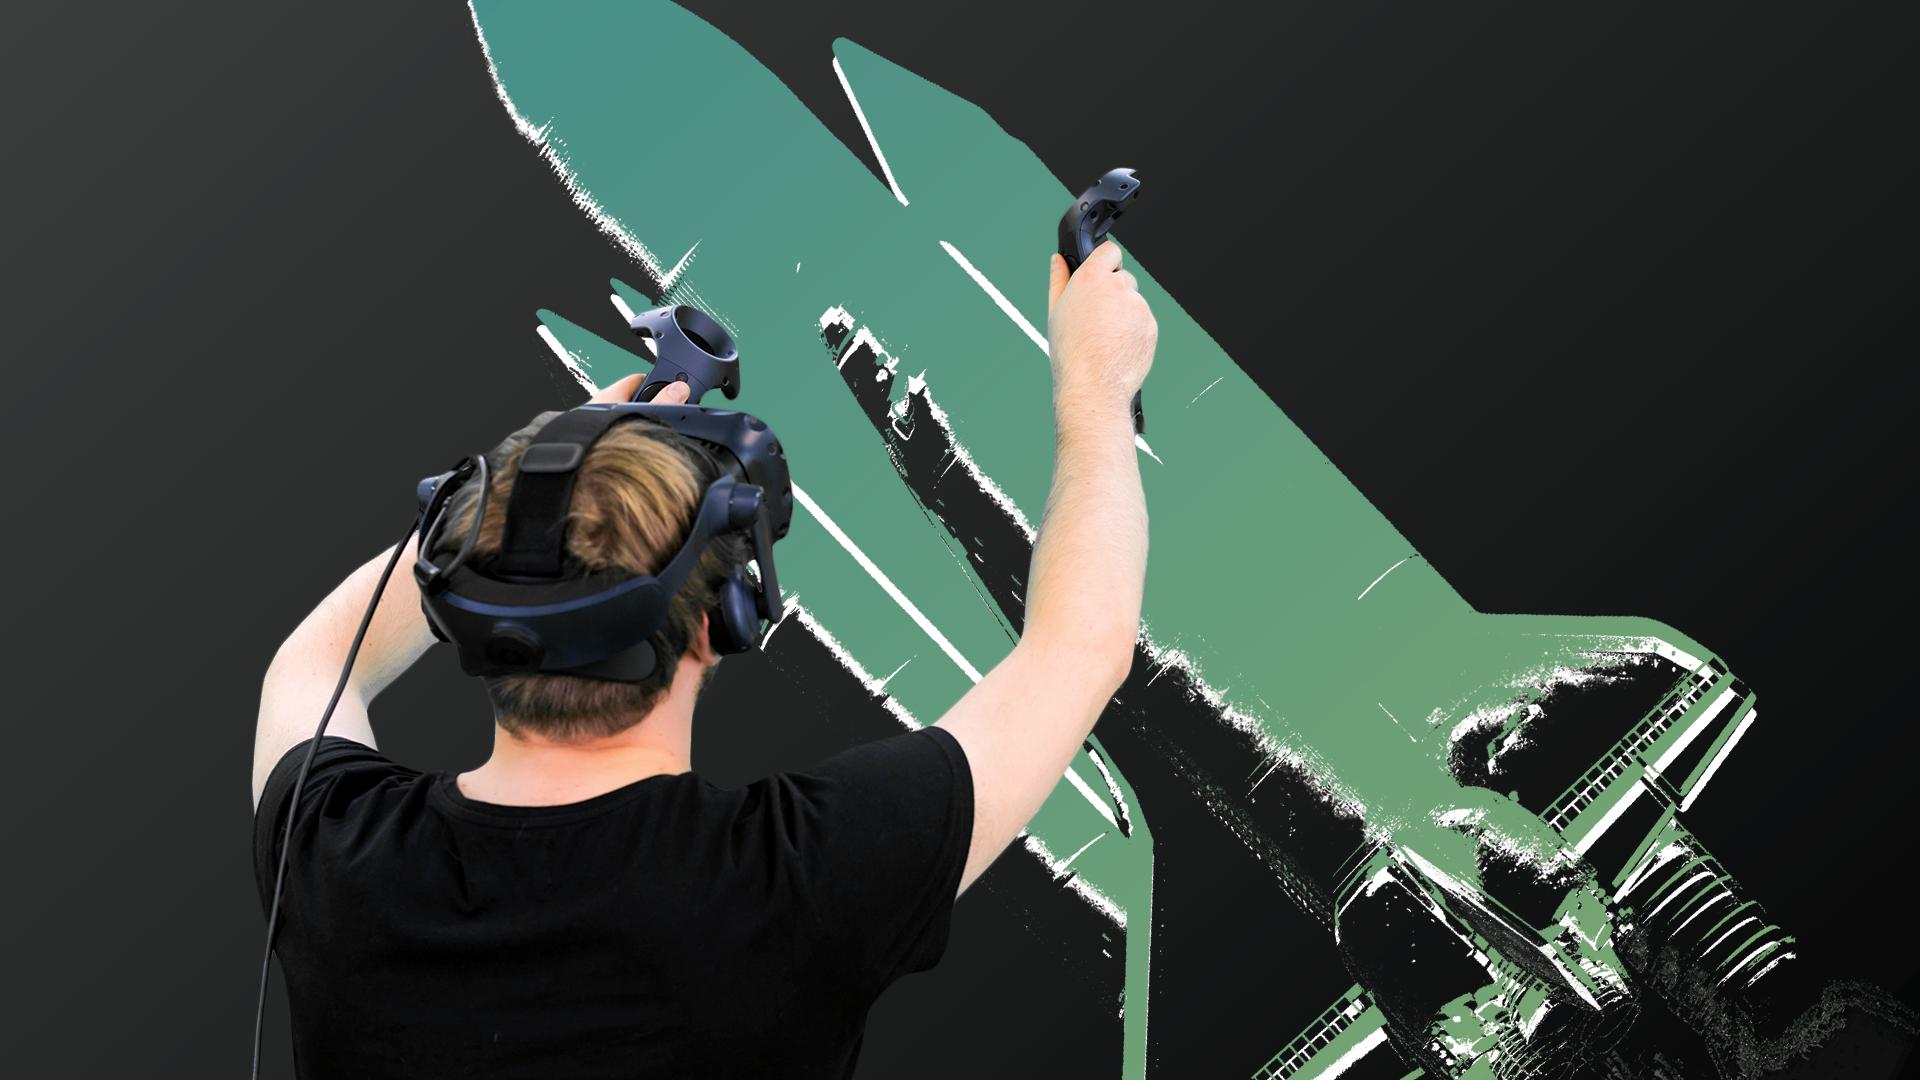 thumbnail rakieta kreatywne aplikacje VR